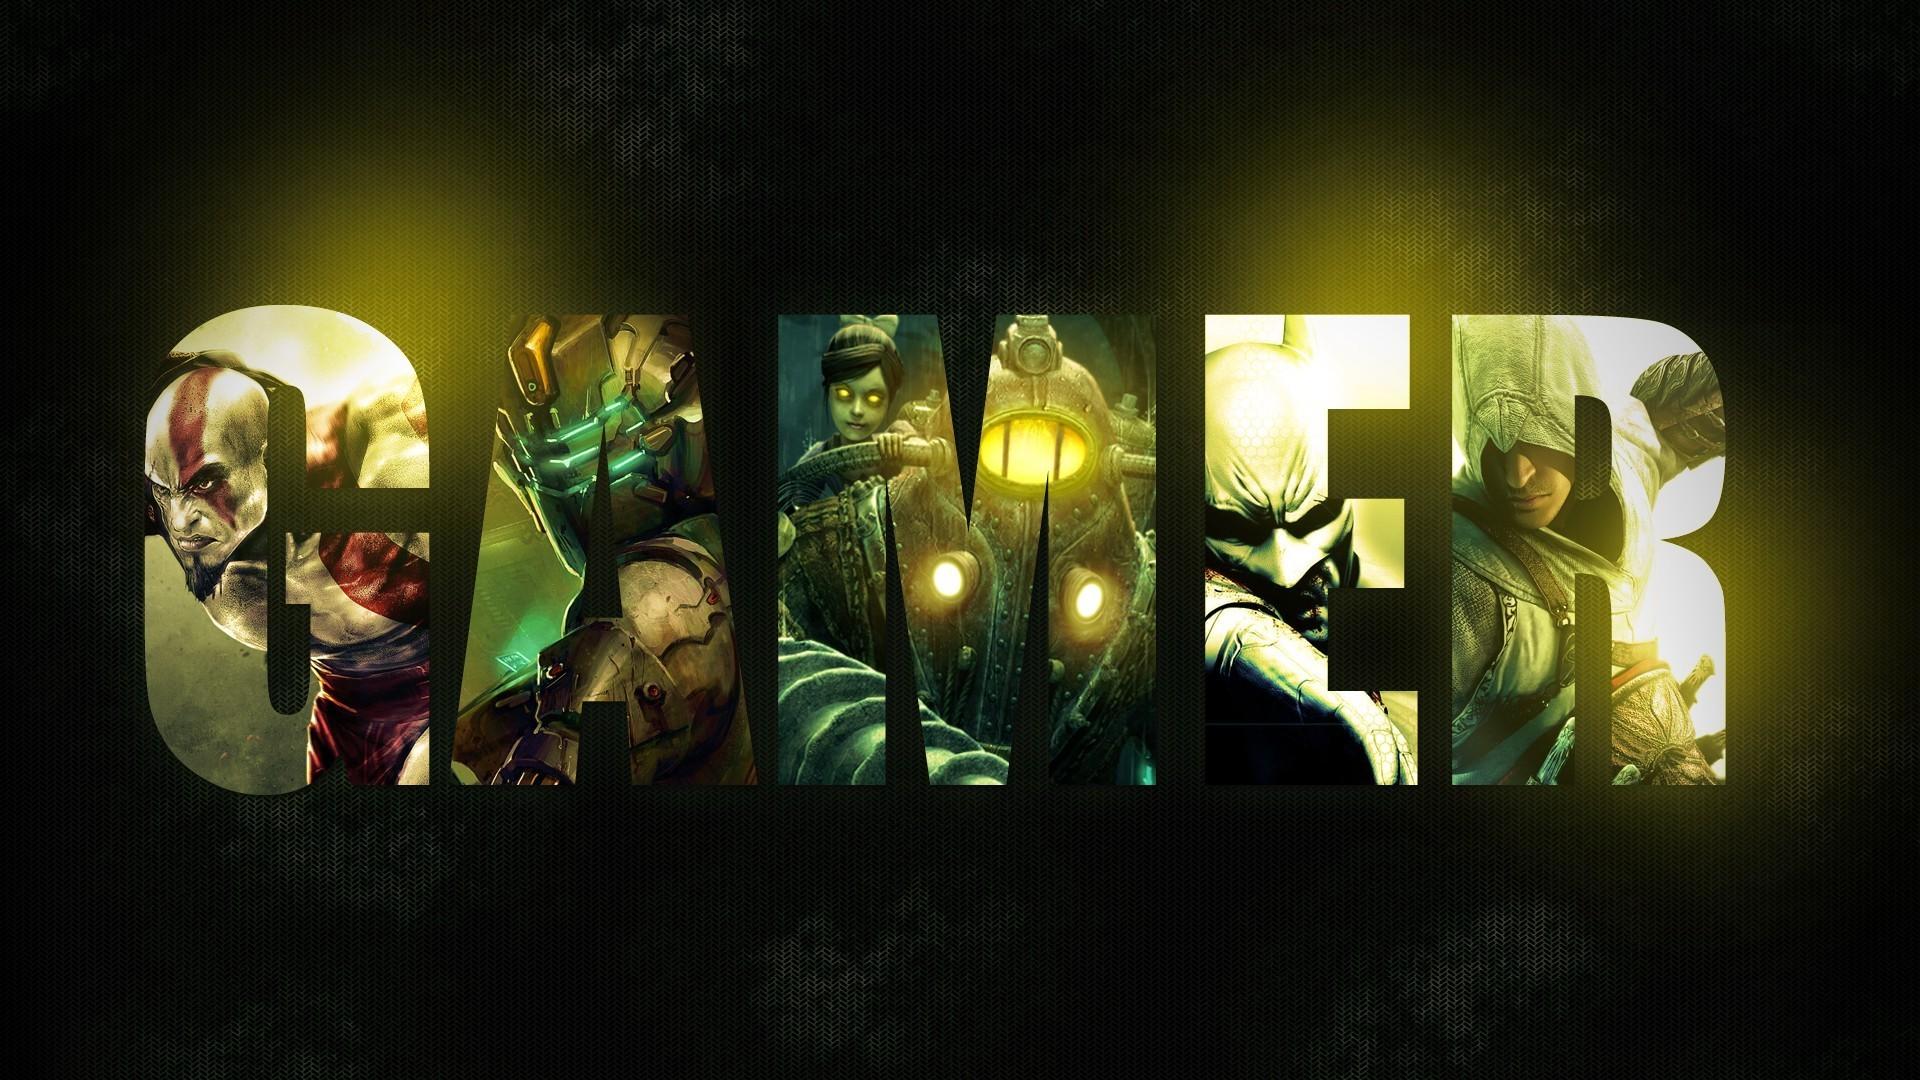 hd gaming wallpaper ·①